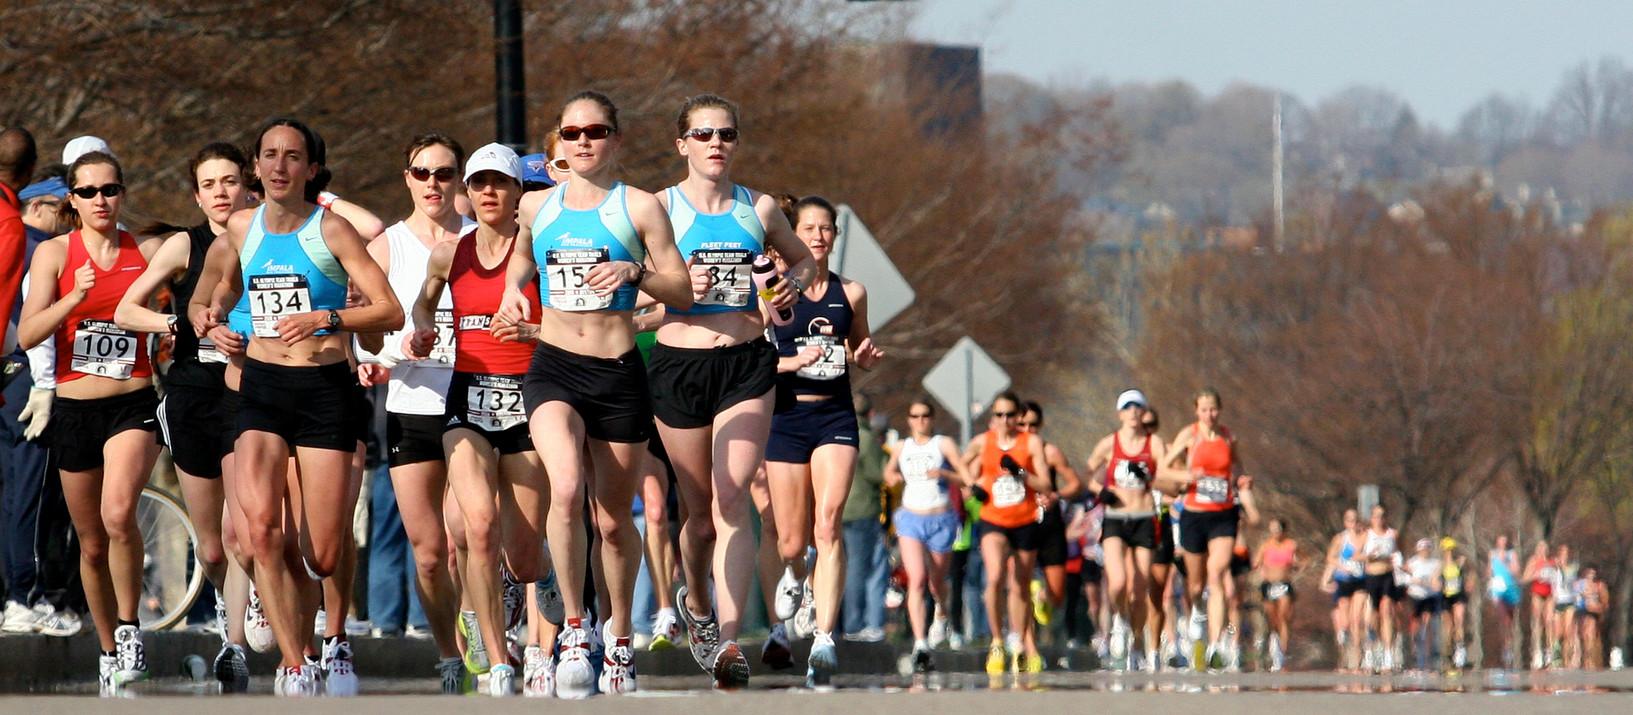 24_Women's_Olympic_Trial_Marathon._Bosto